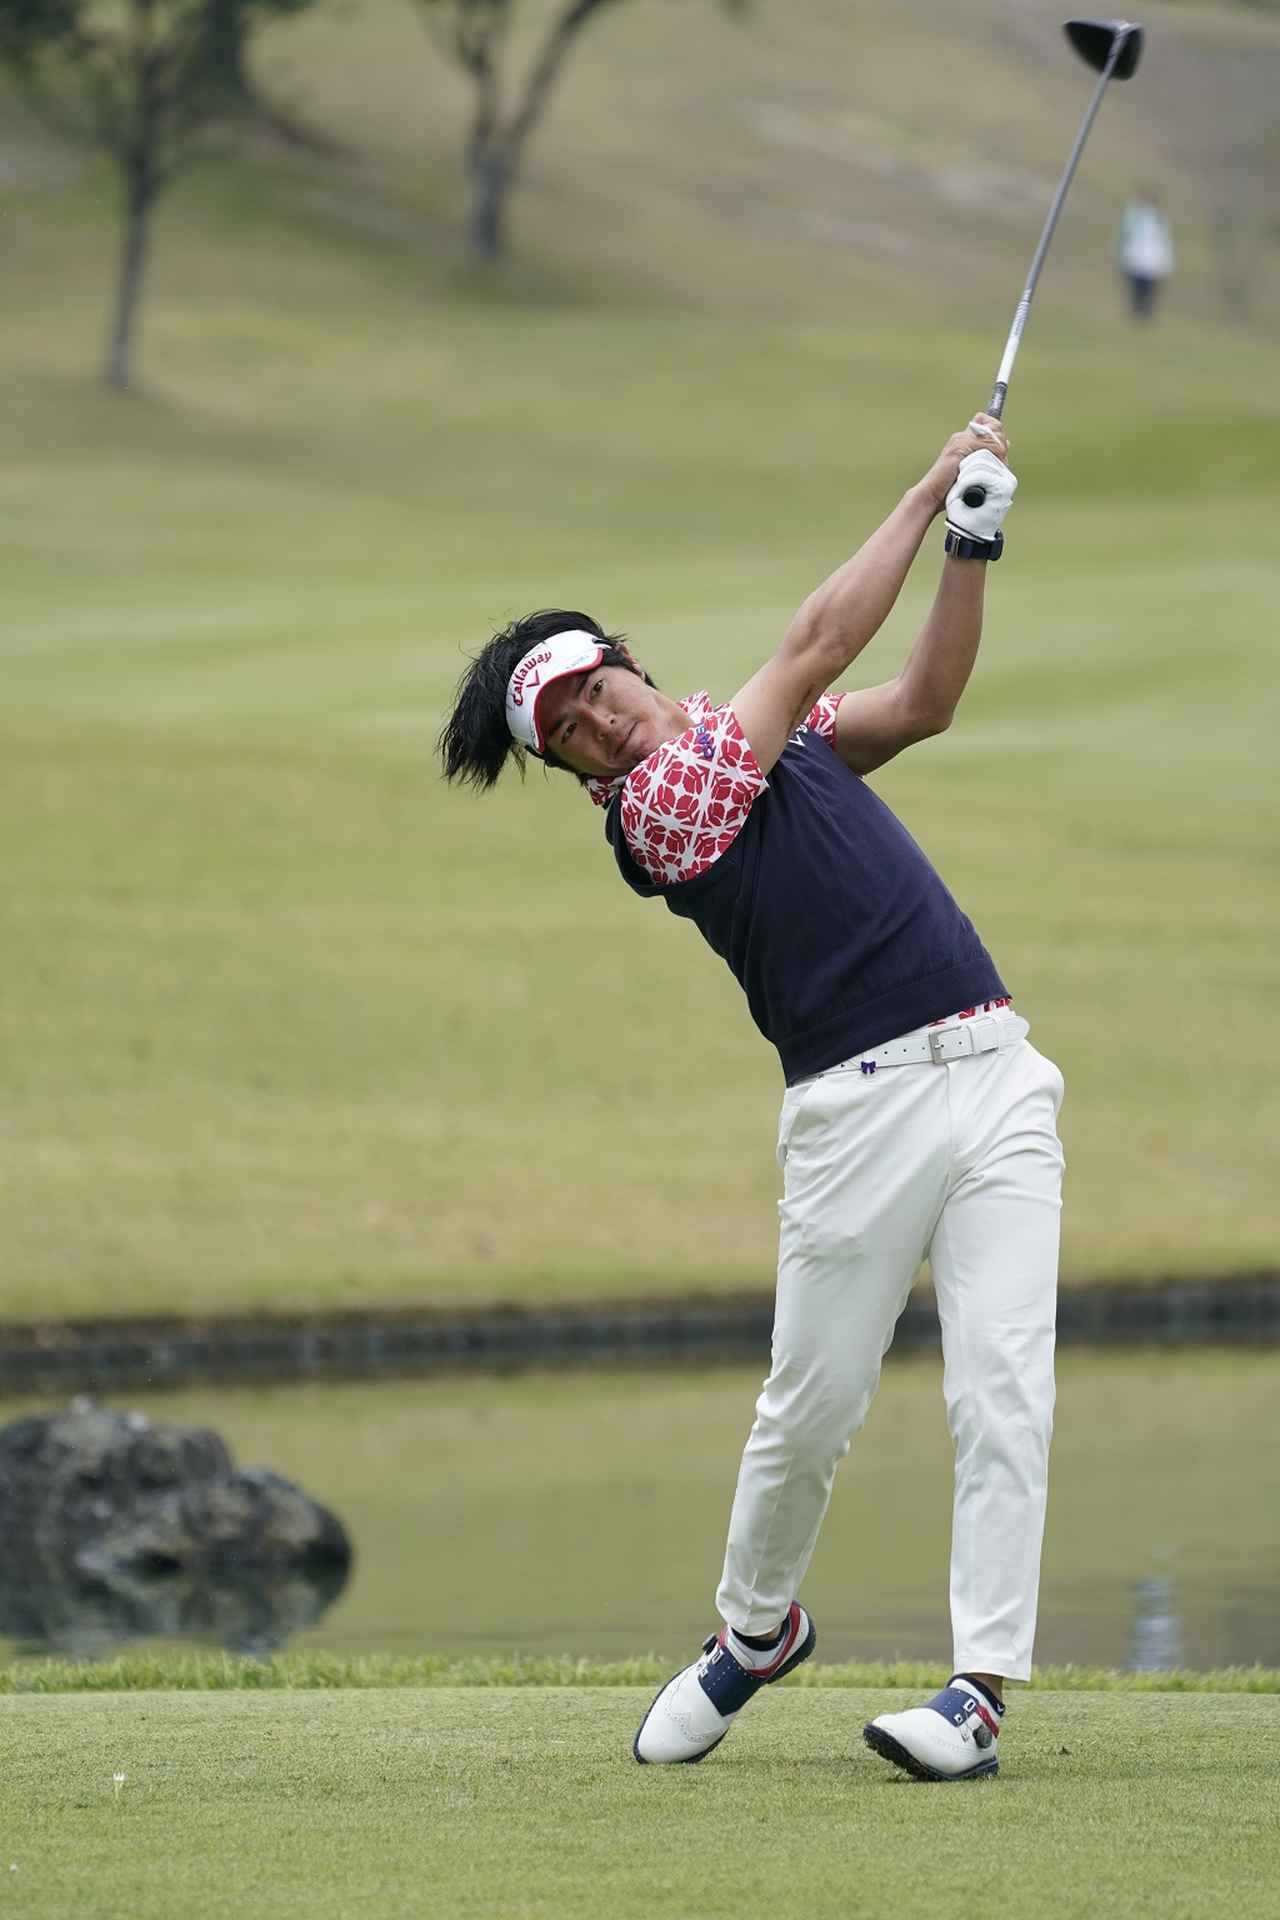 Images : 14番目の画像 - 石川遼ドライバー前方連続写真 - みんなのゴルフダイジェスト